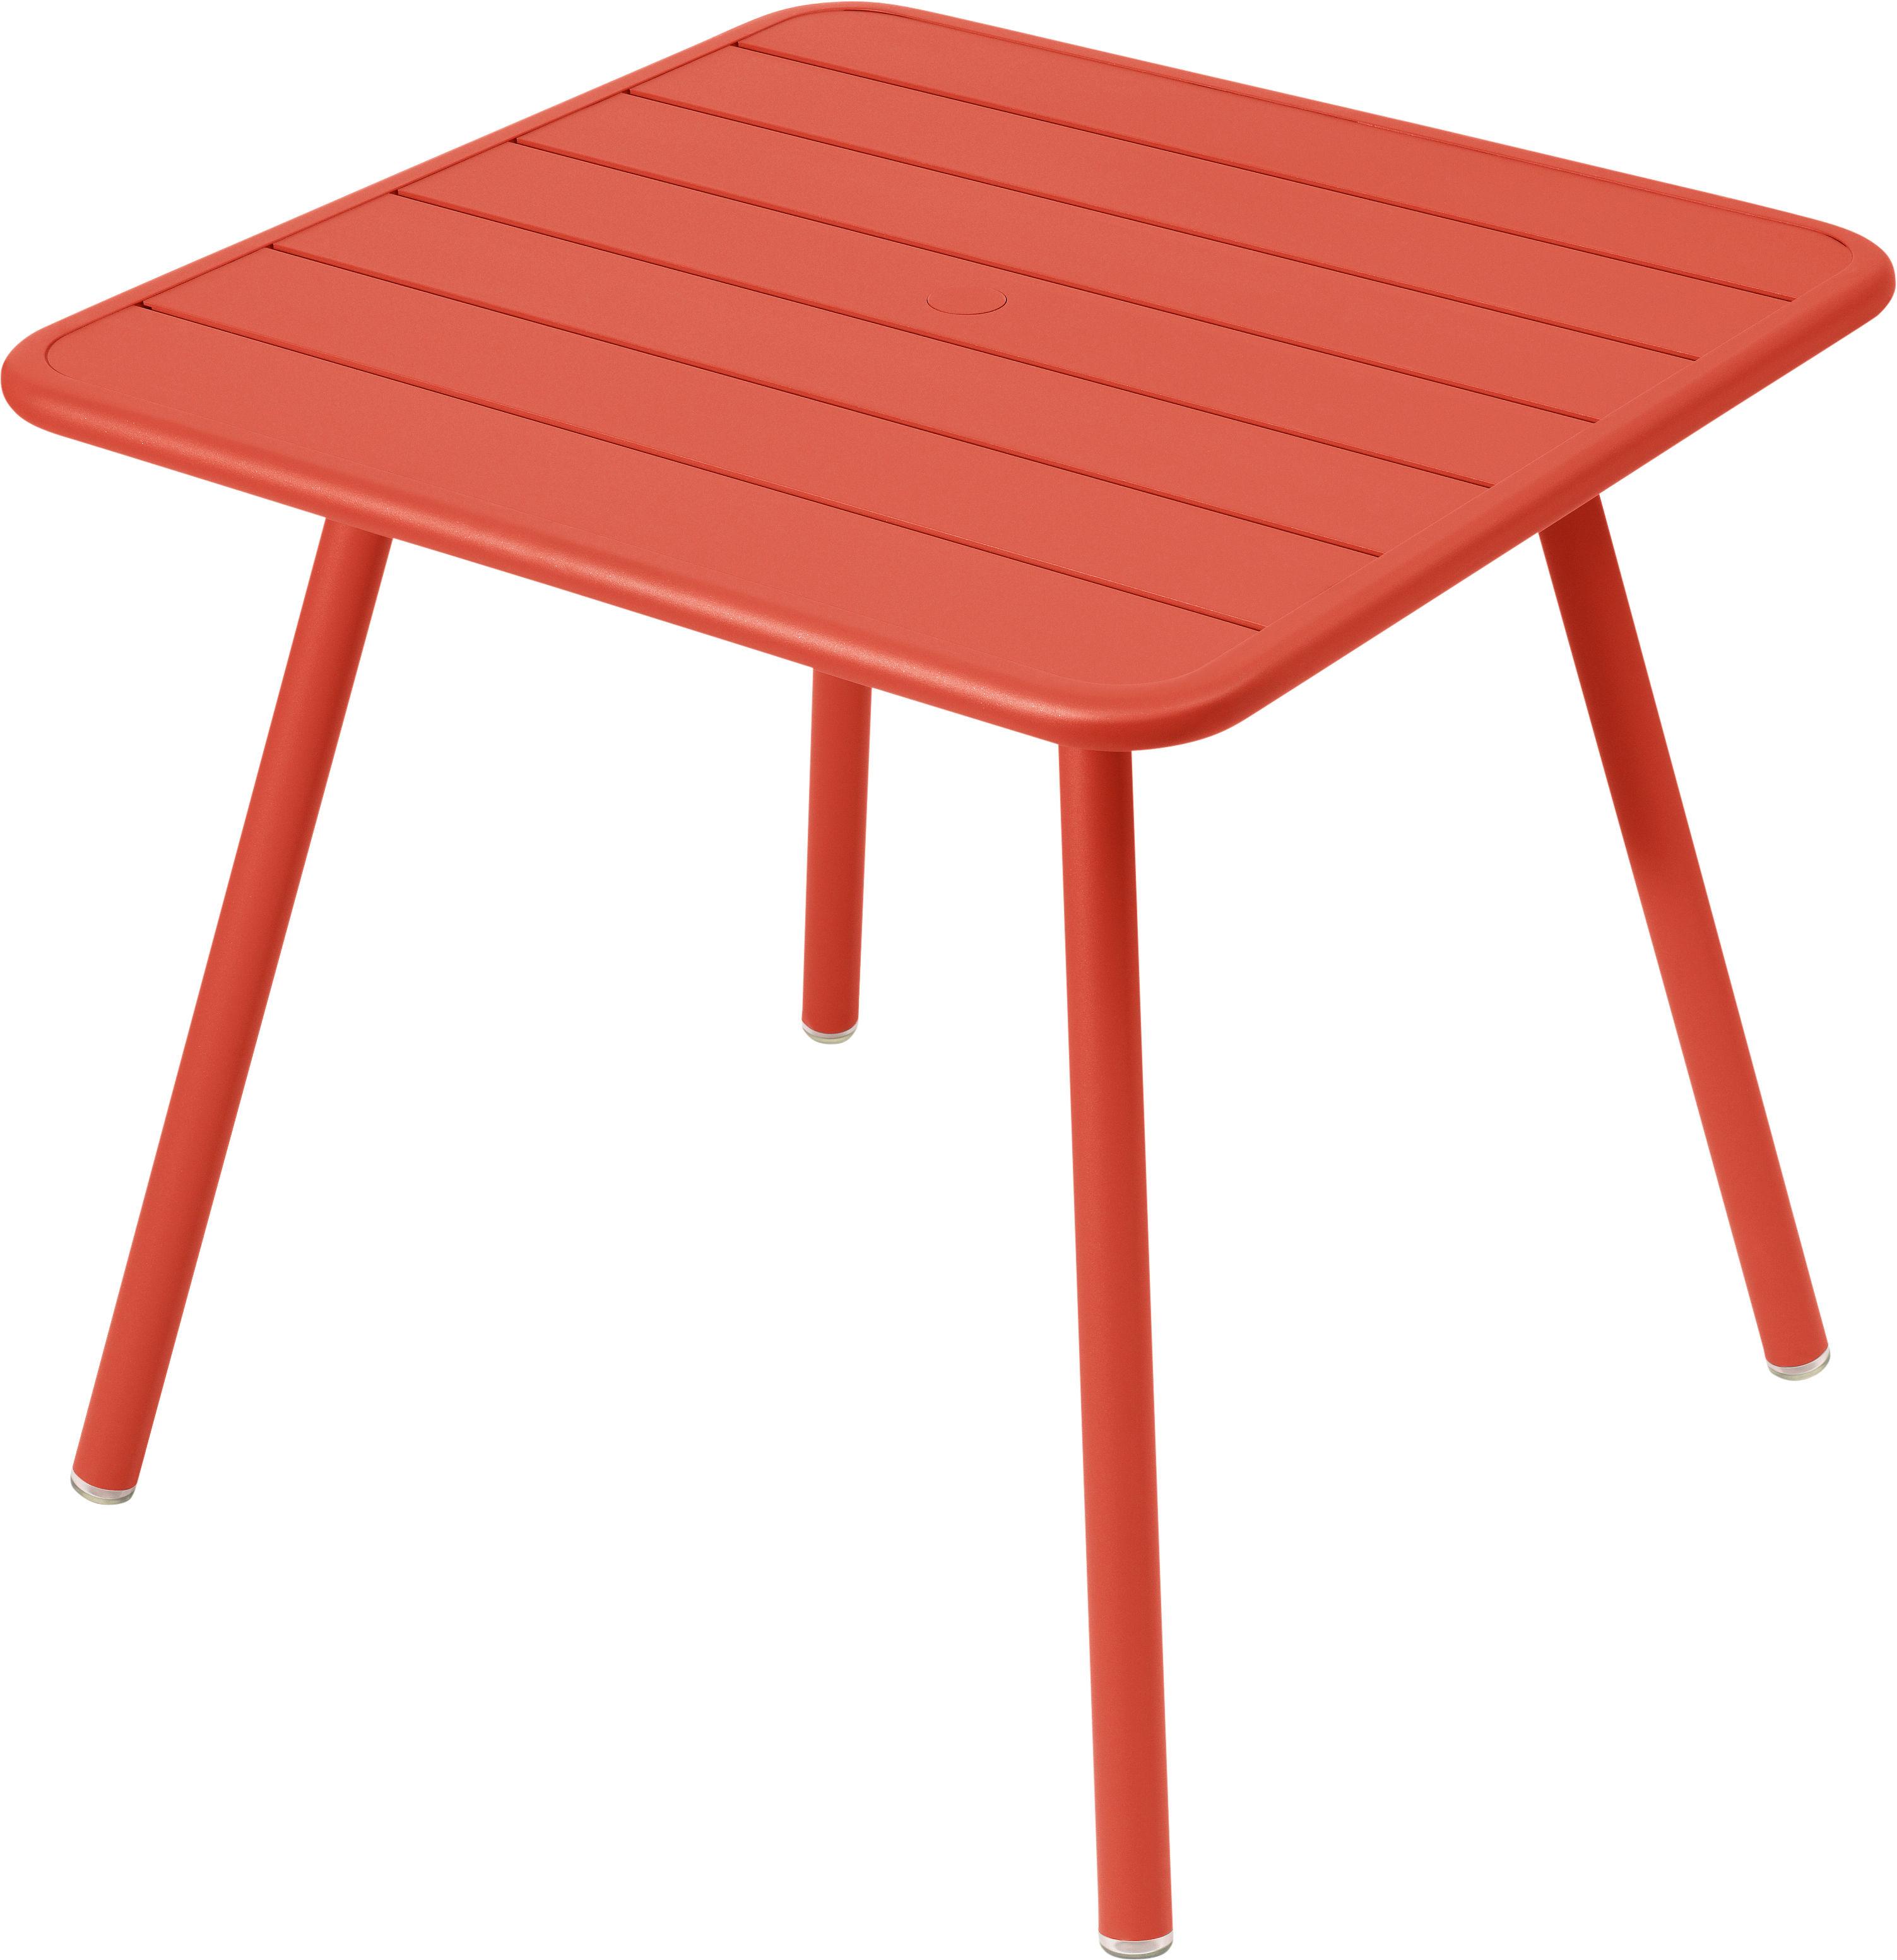 Jardin - Tables de jardin - Table Luxembourg / 80 x 80 cm - 4 pieds - Fermob - Capucine - Aluminium laqué